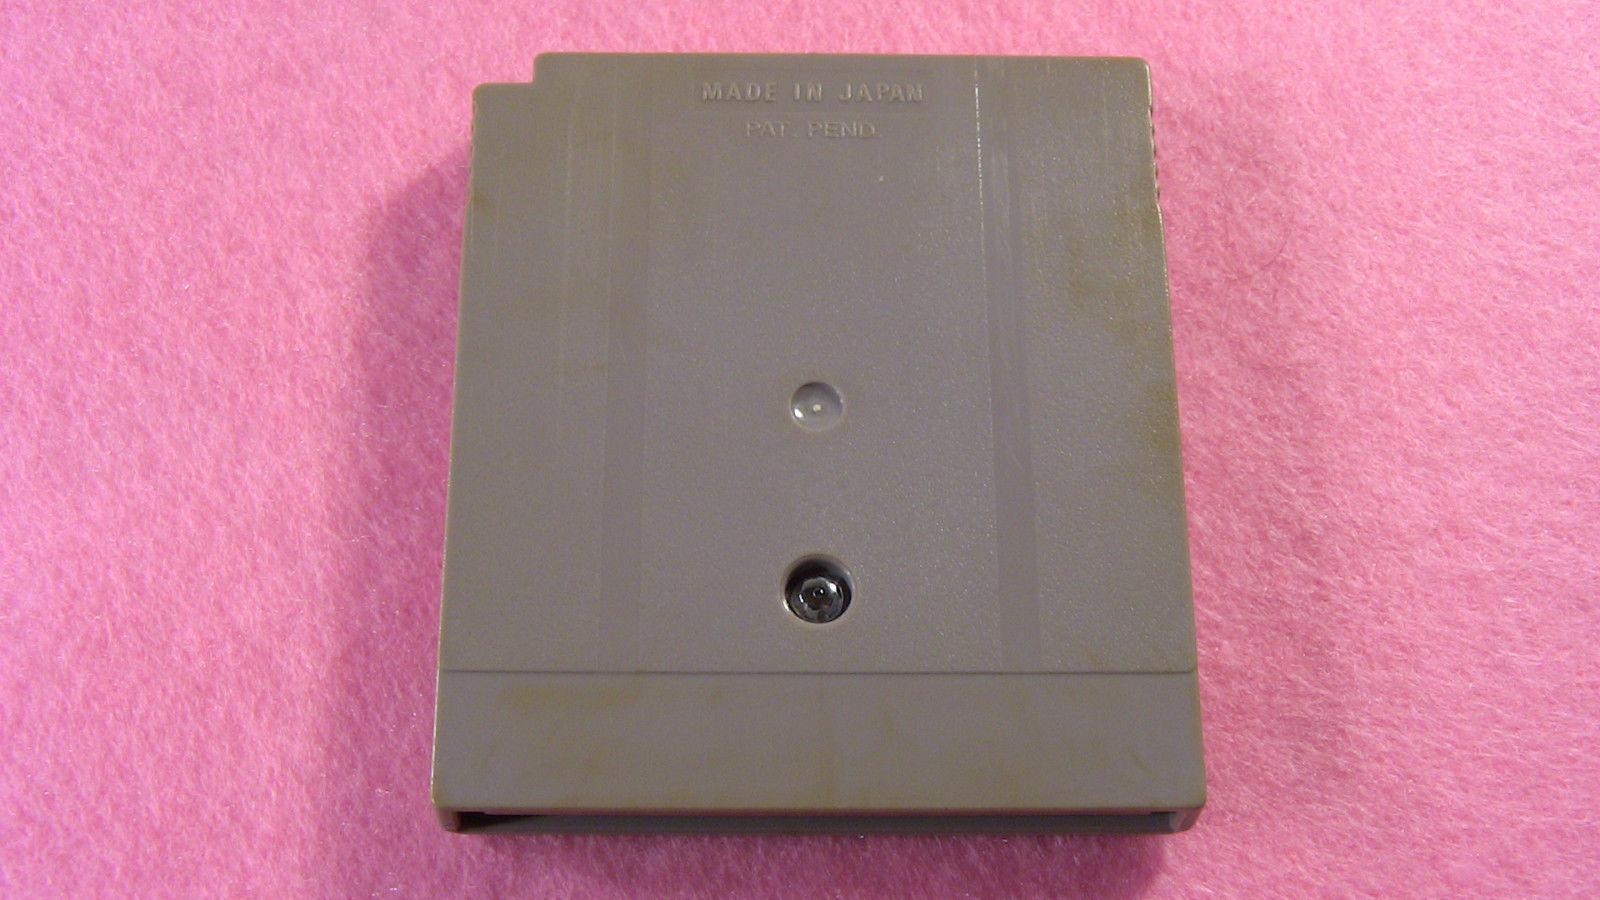 Magical Taruruuto-kun (Nintendo Game Boy GB, 1991) Japan Import